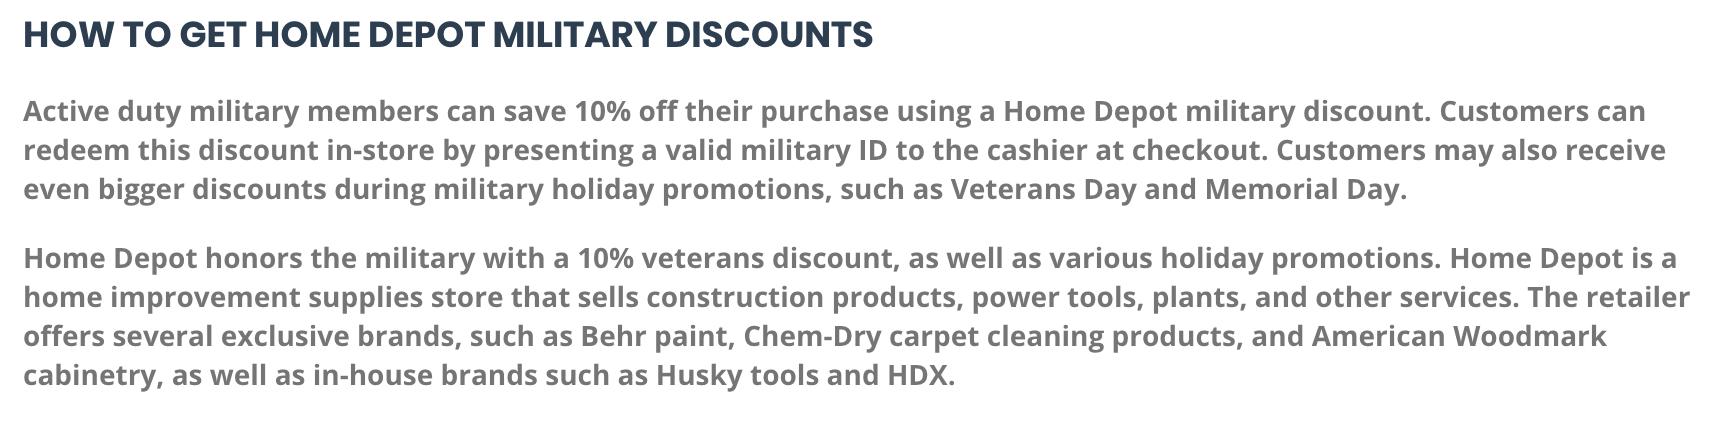 Home Depot Military Veteran Discounts